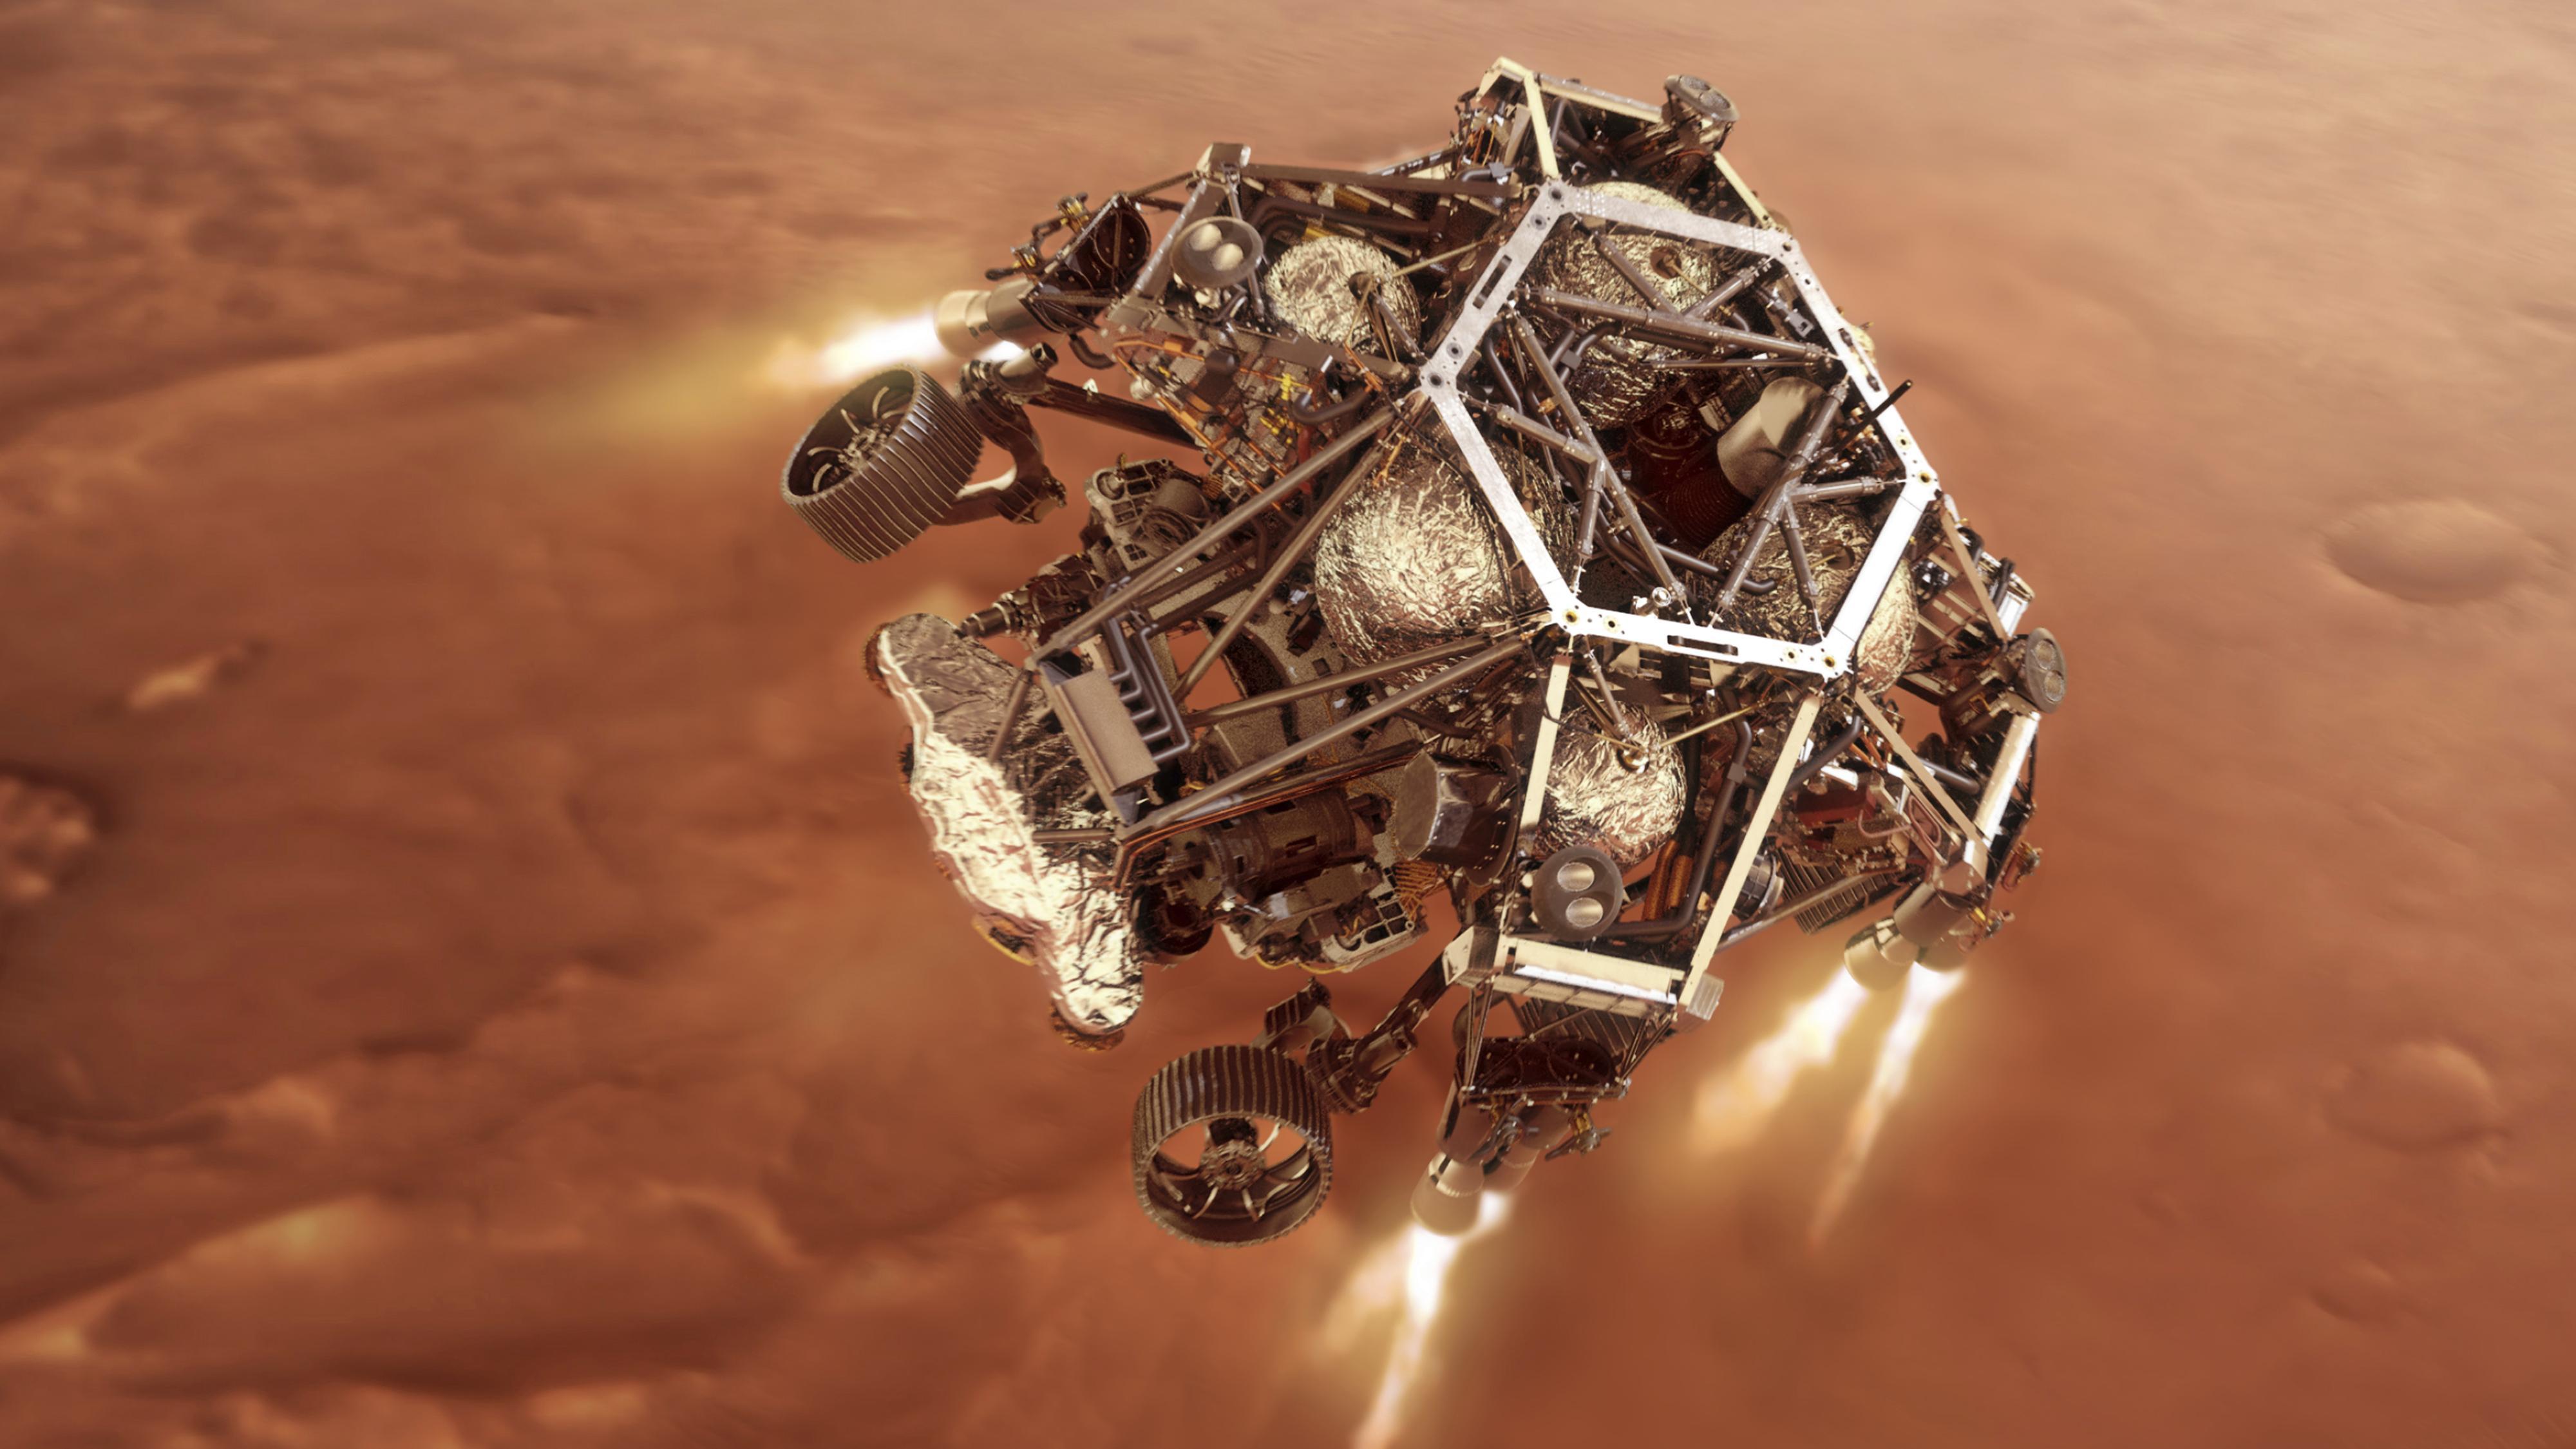 Mye norsk når Perseverance lander på Mars denne uken